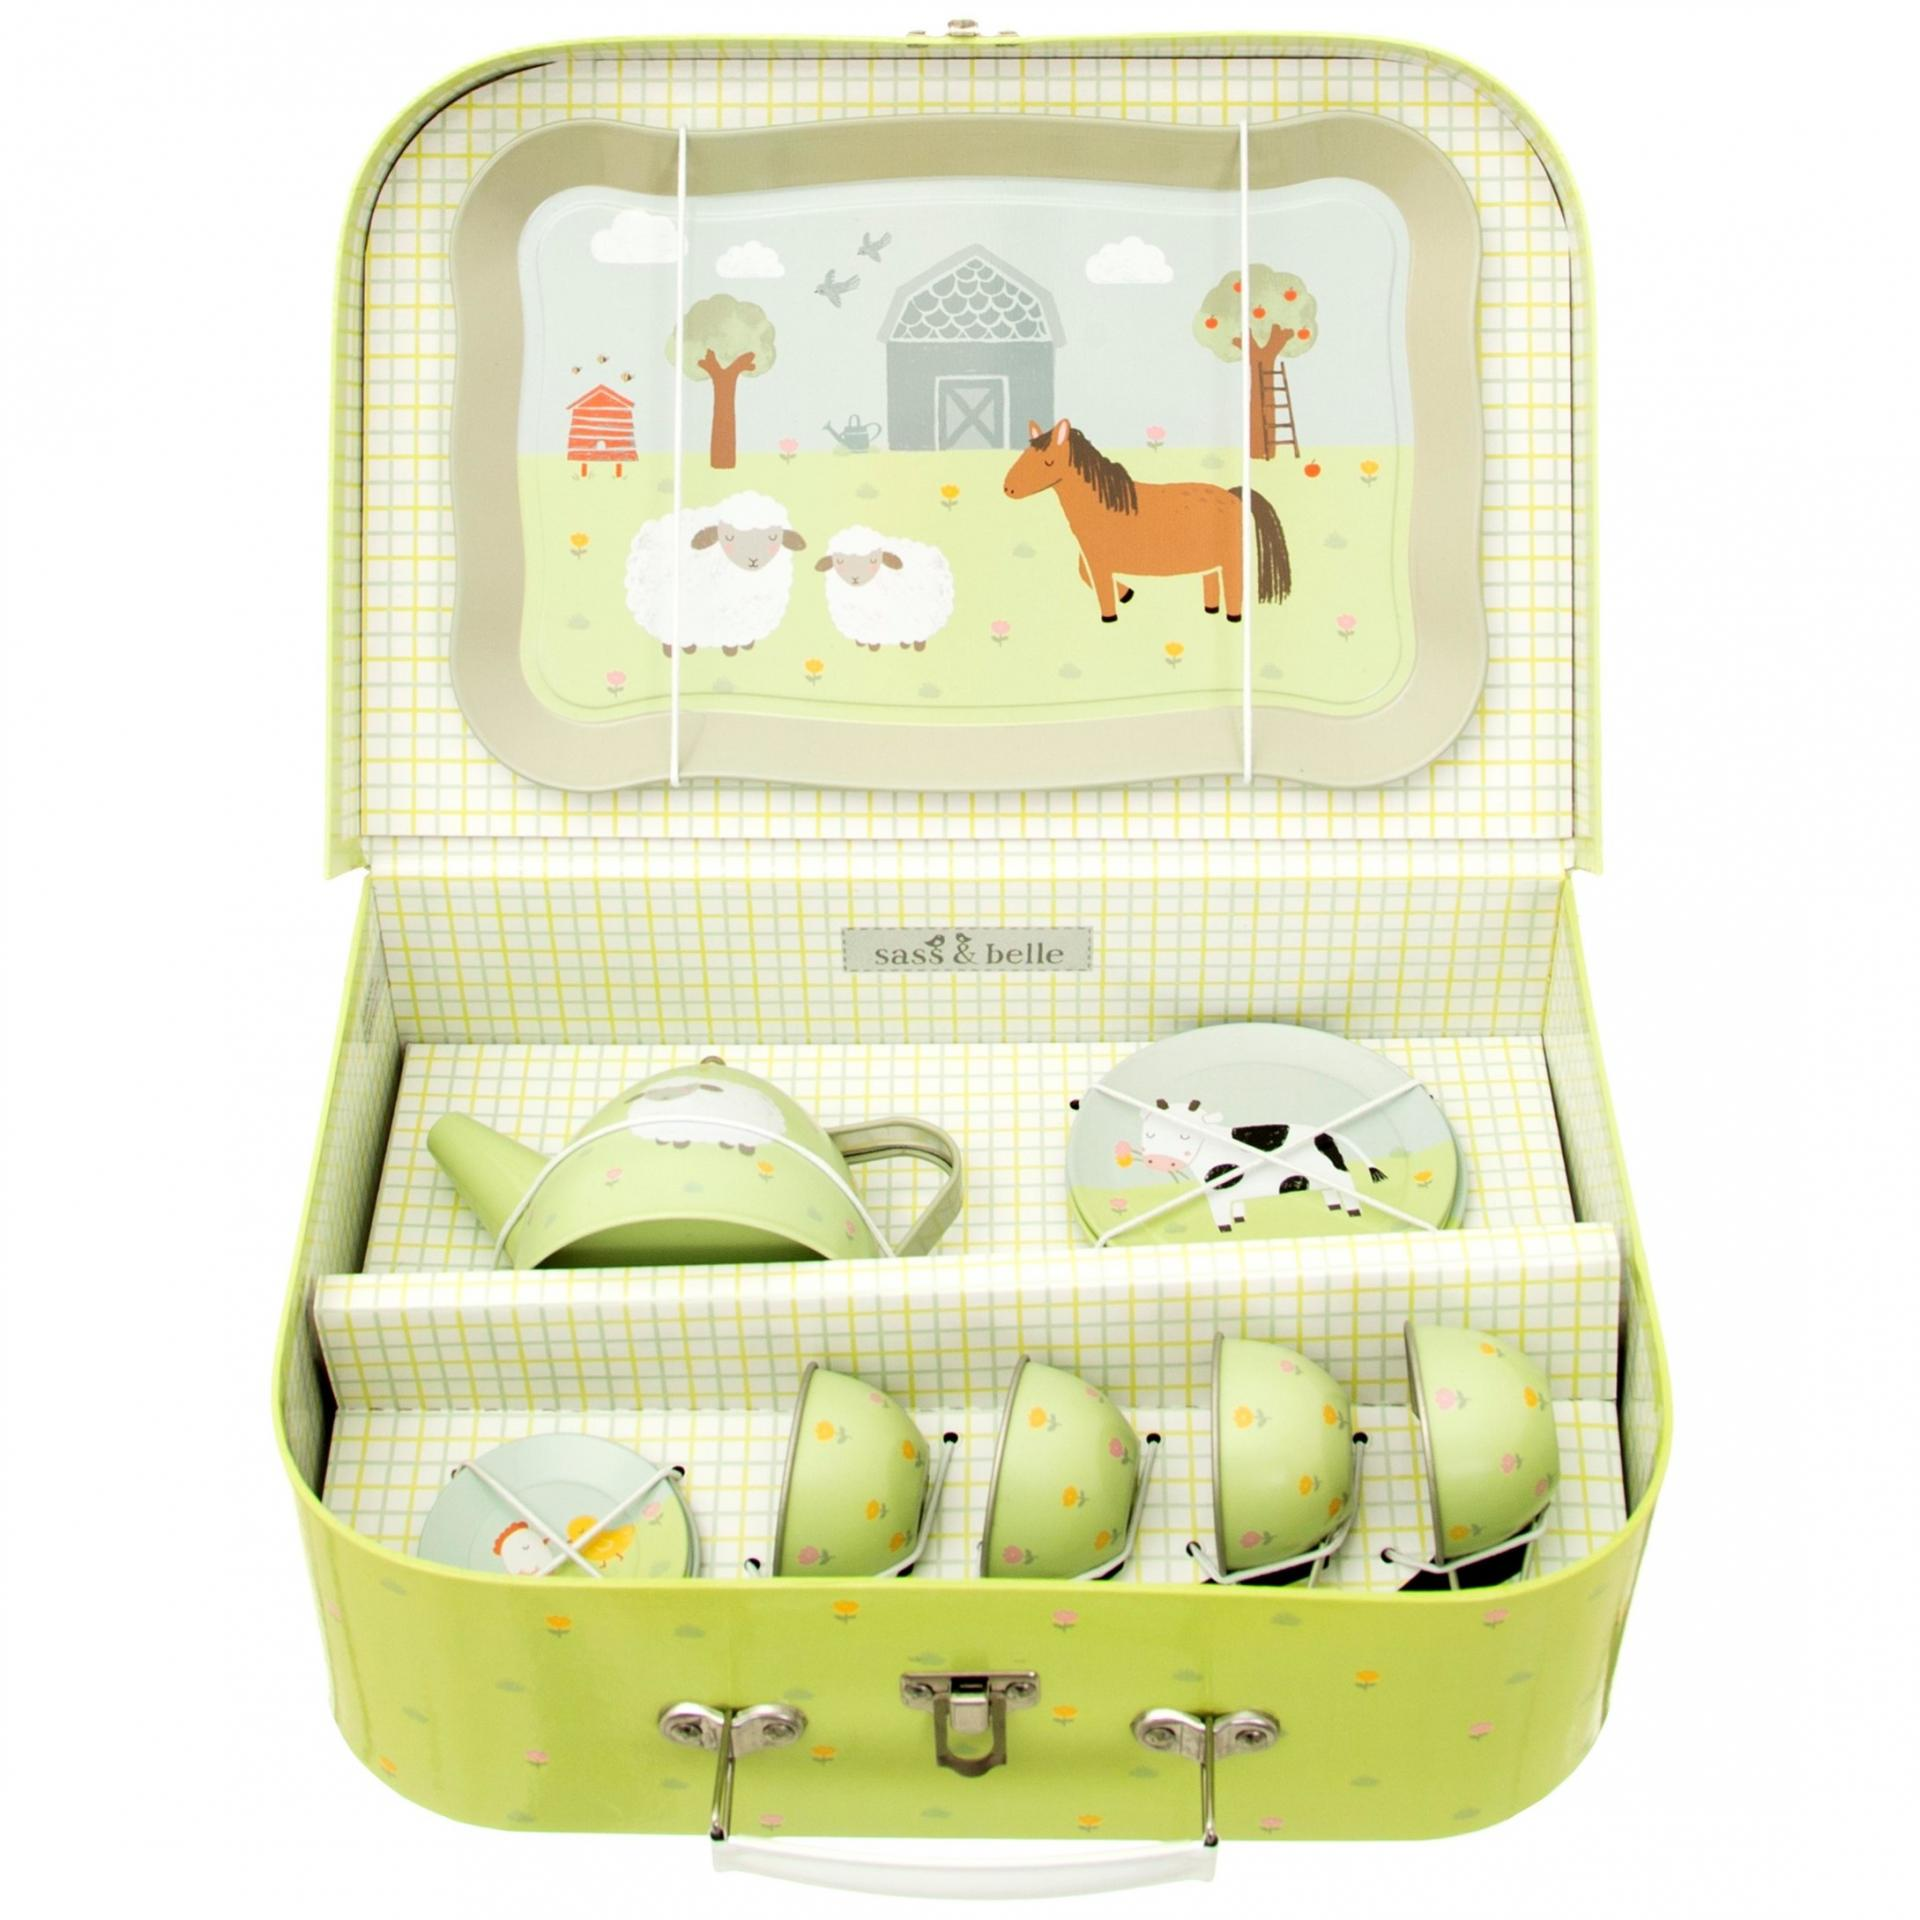 sass & belle Dětský čajový set Farmyard Friends, zelená barva, kov, papír